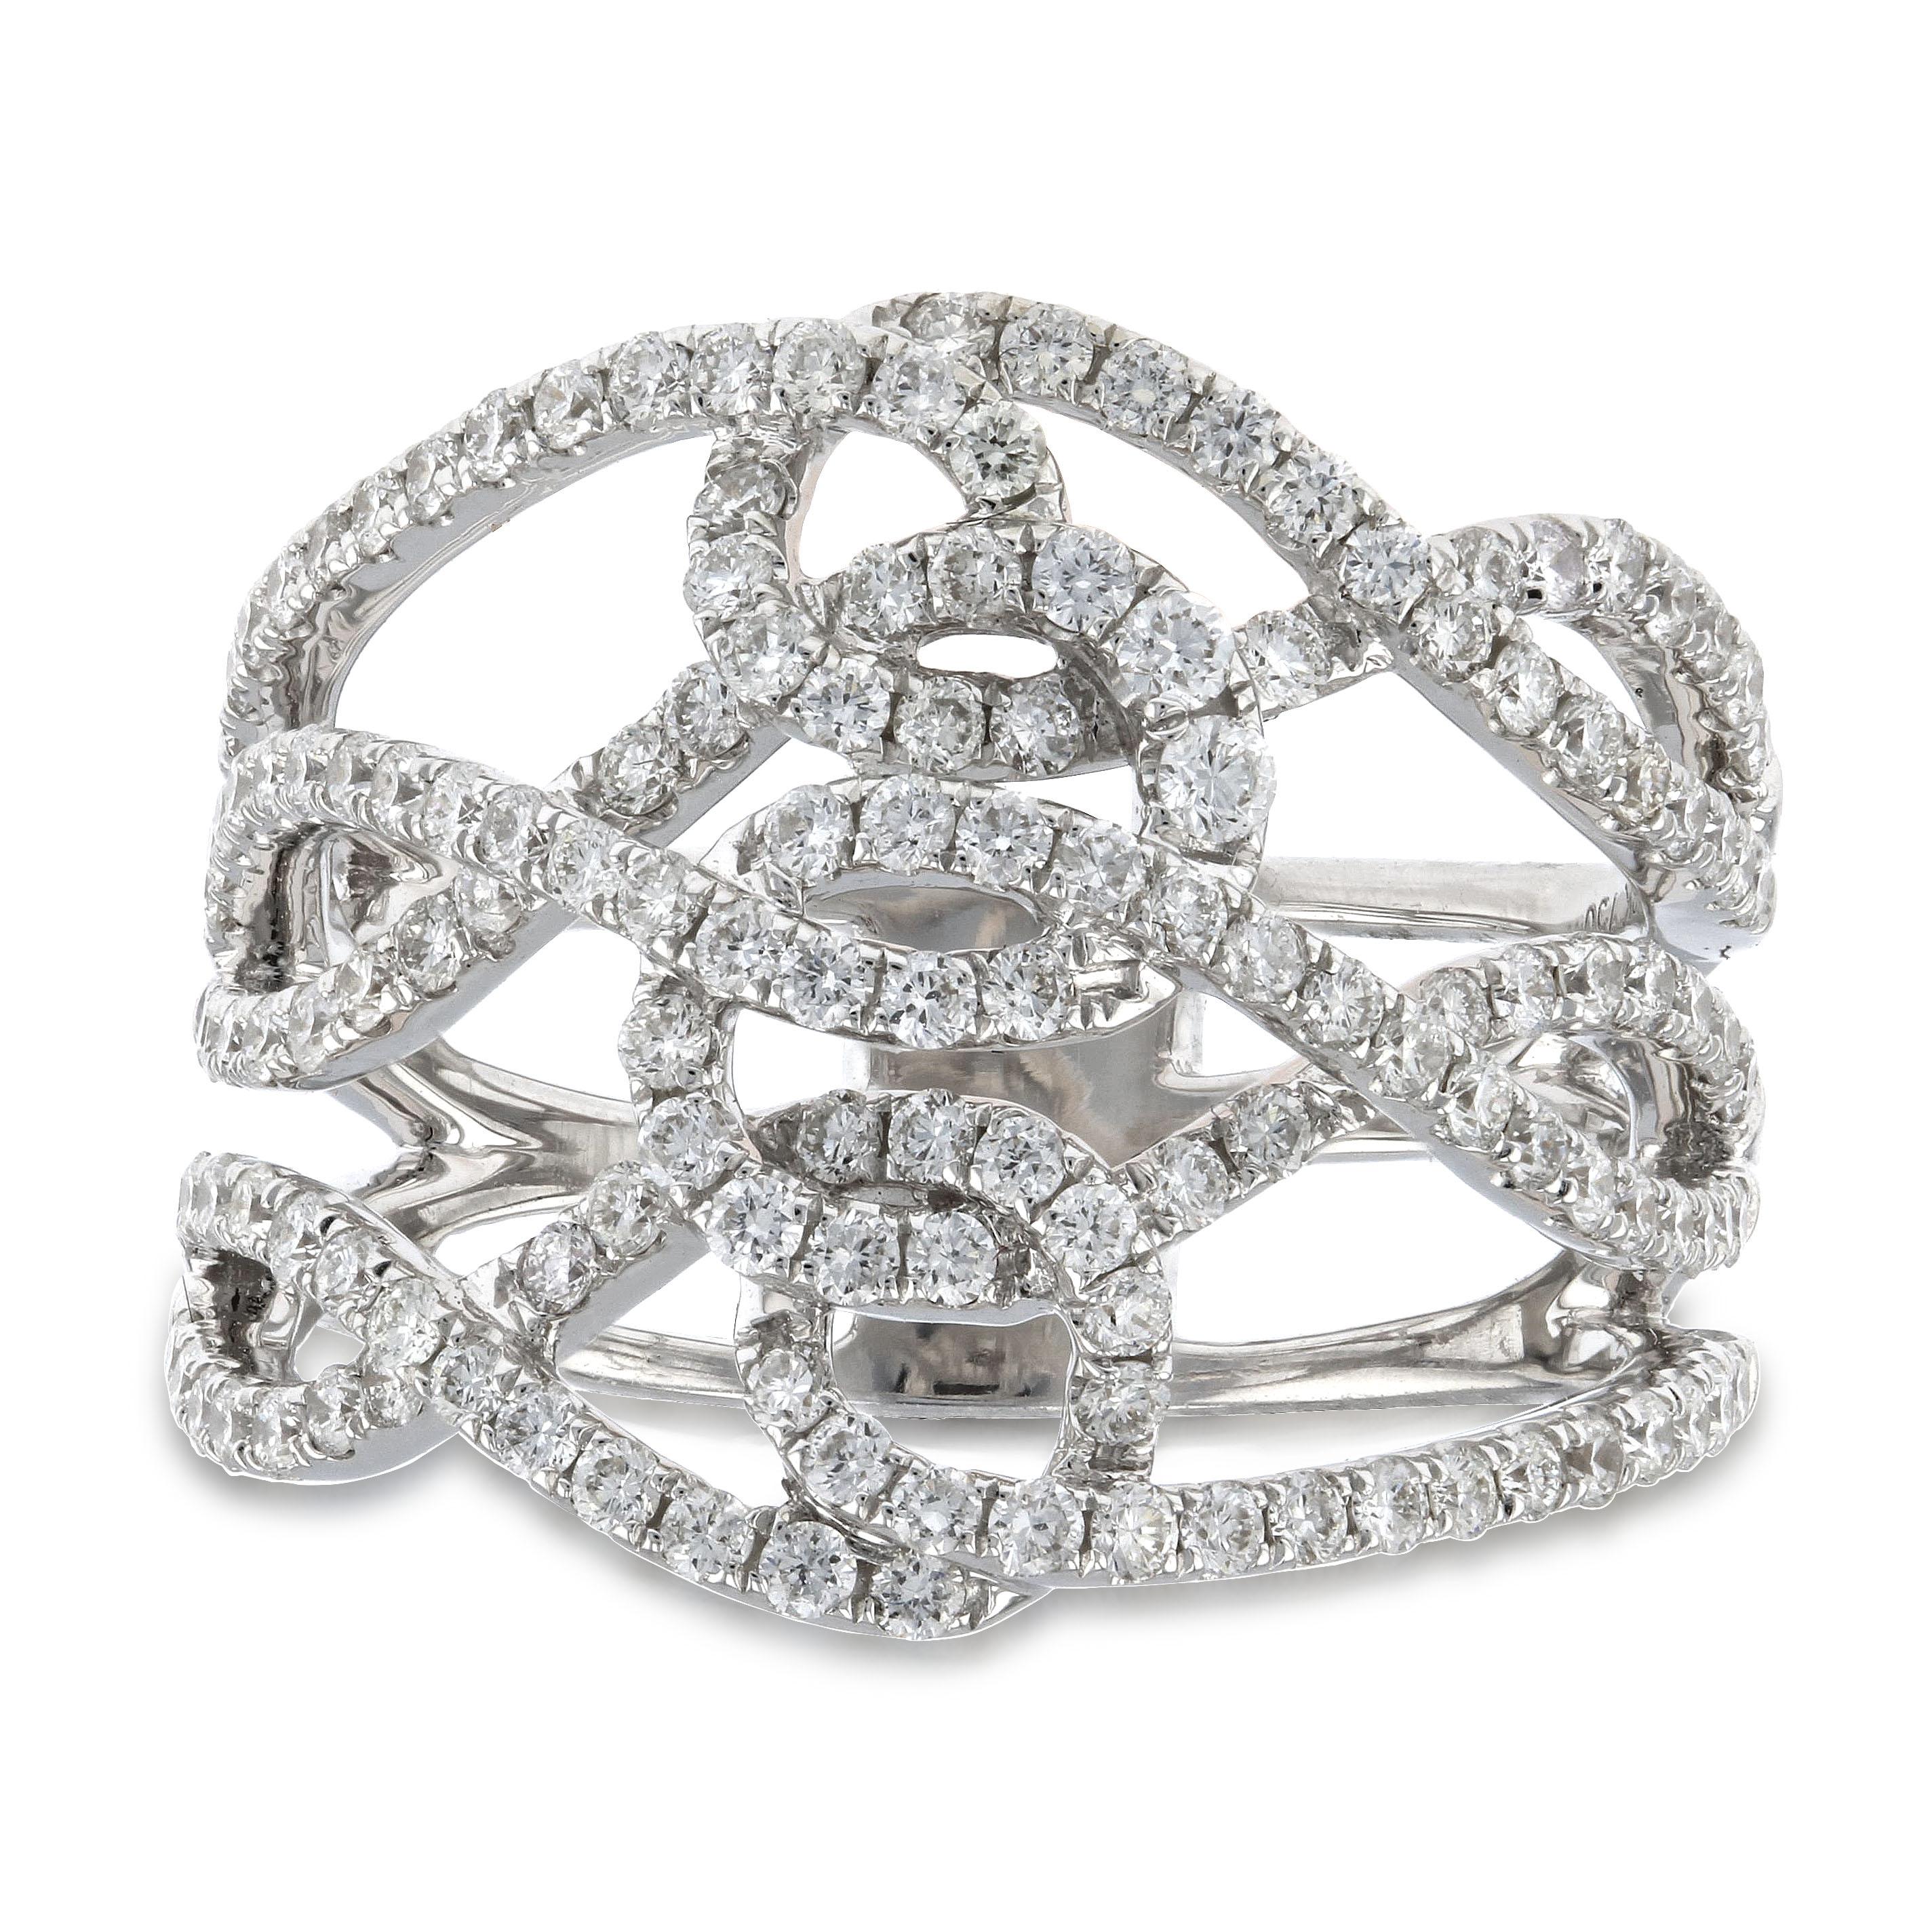 View 1.13ctw Diamond Fashion Ring in 18k White Gold